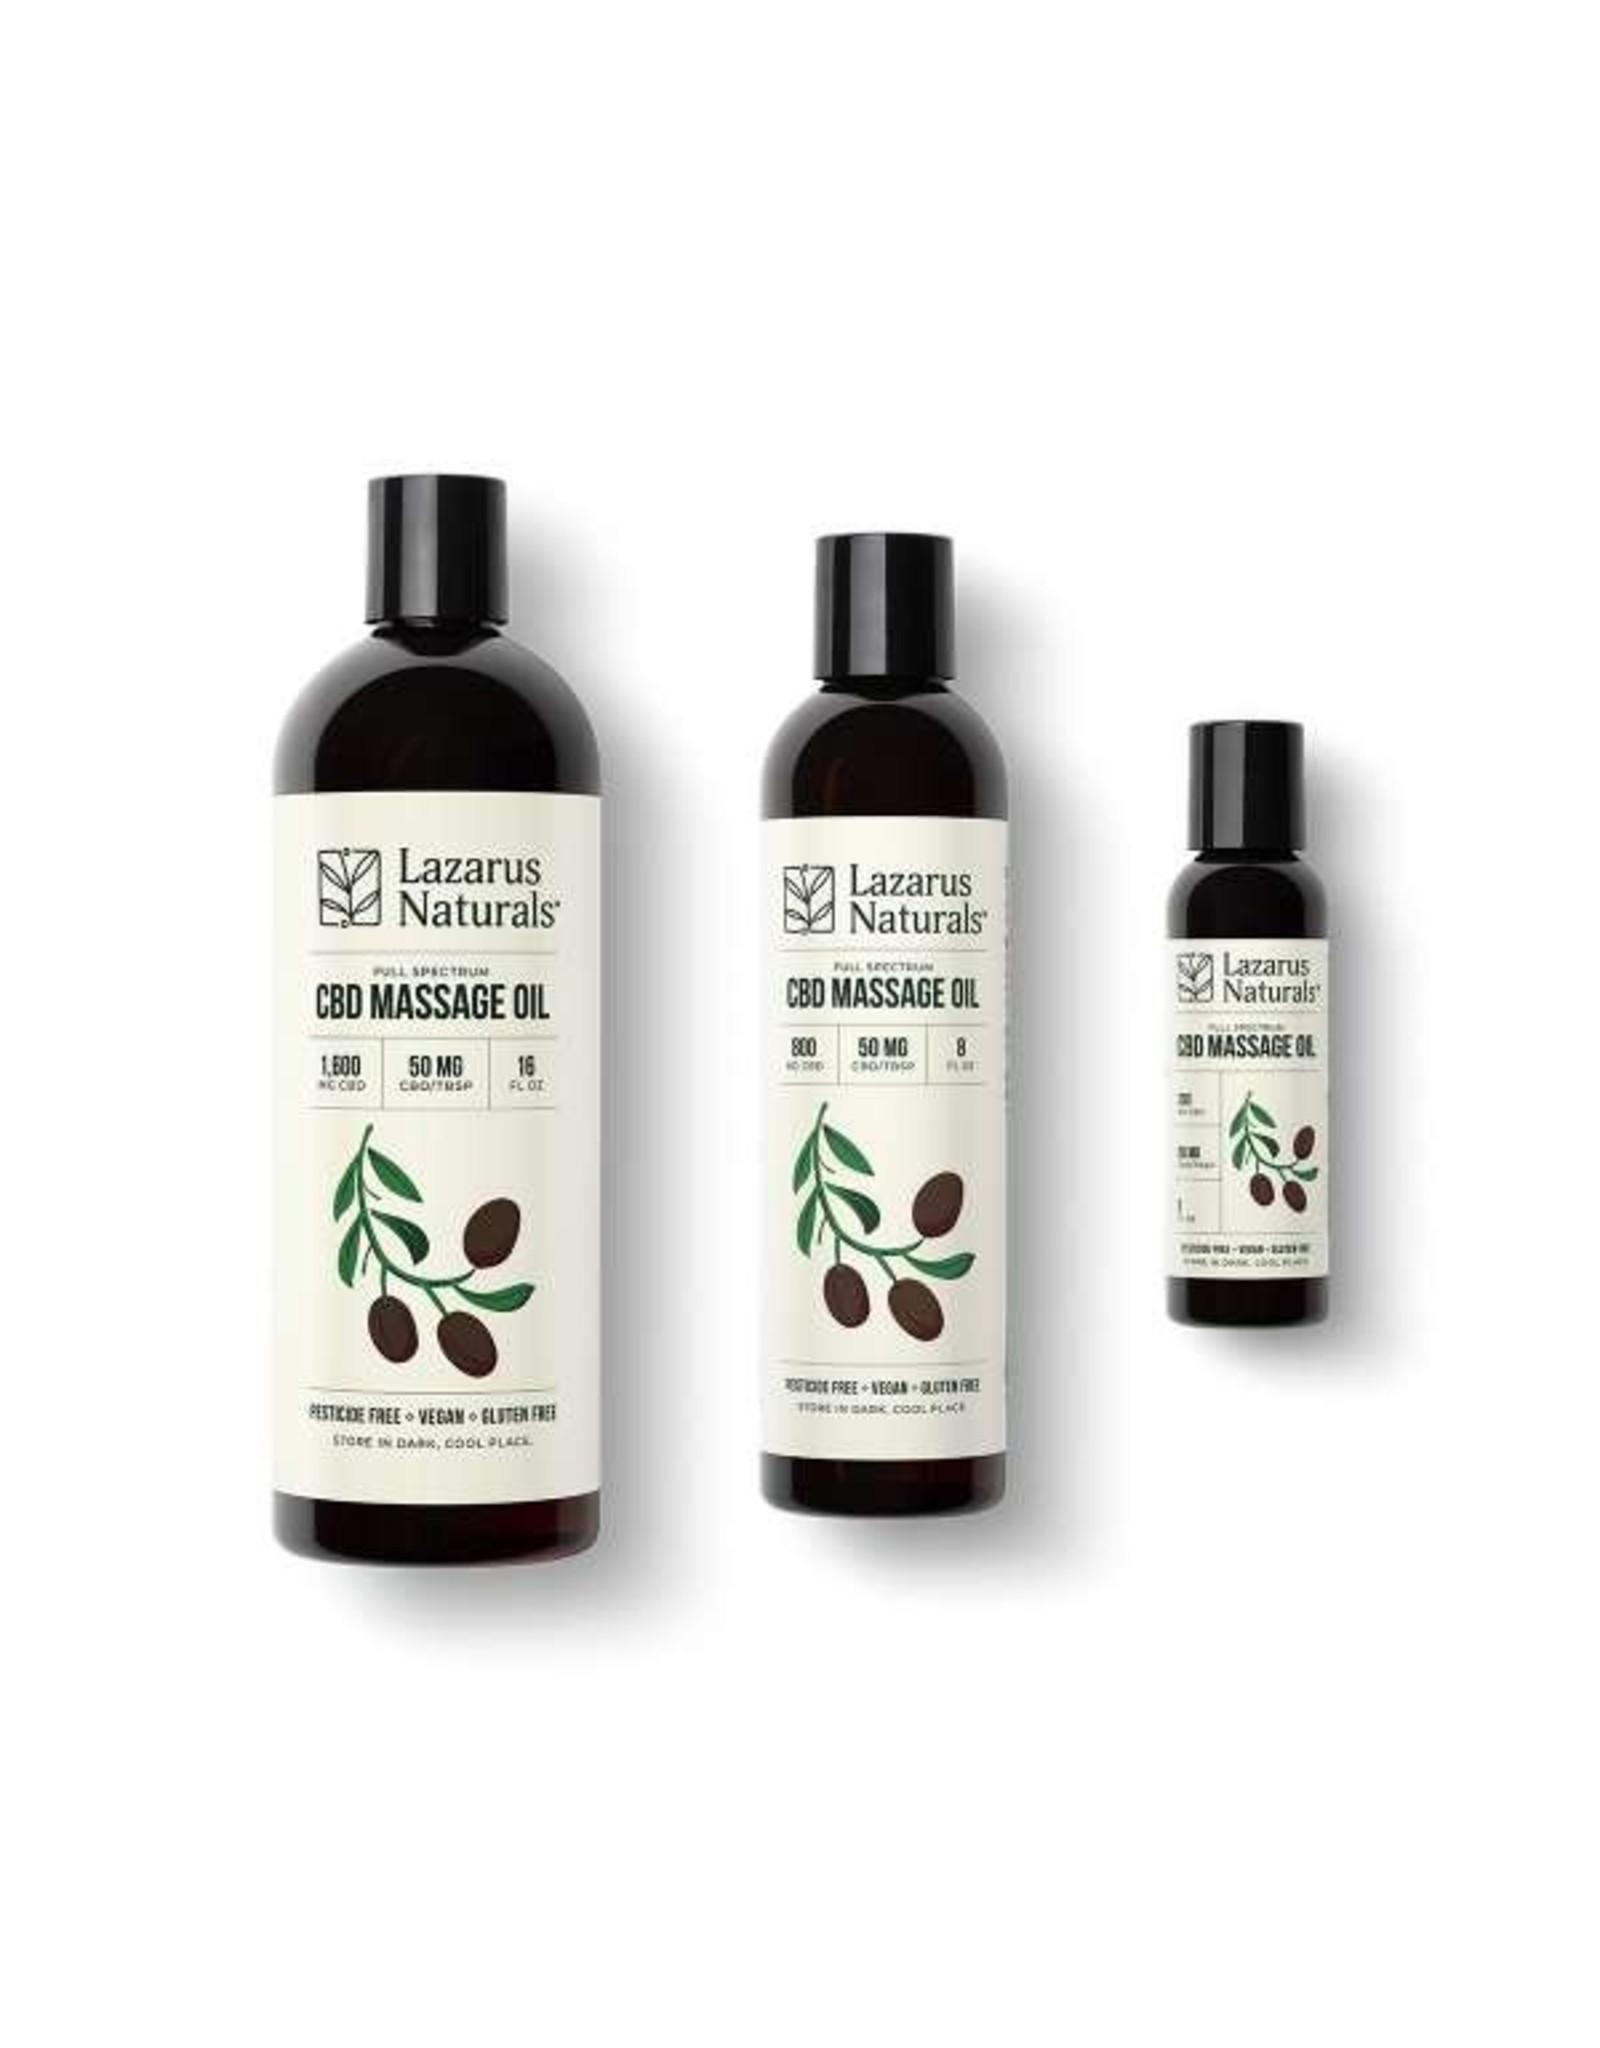 Lazarus Naturals 16fl massage oil